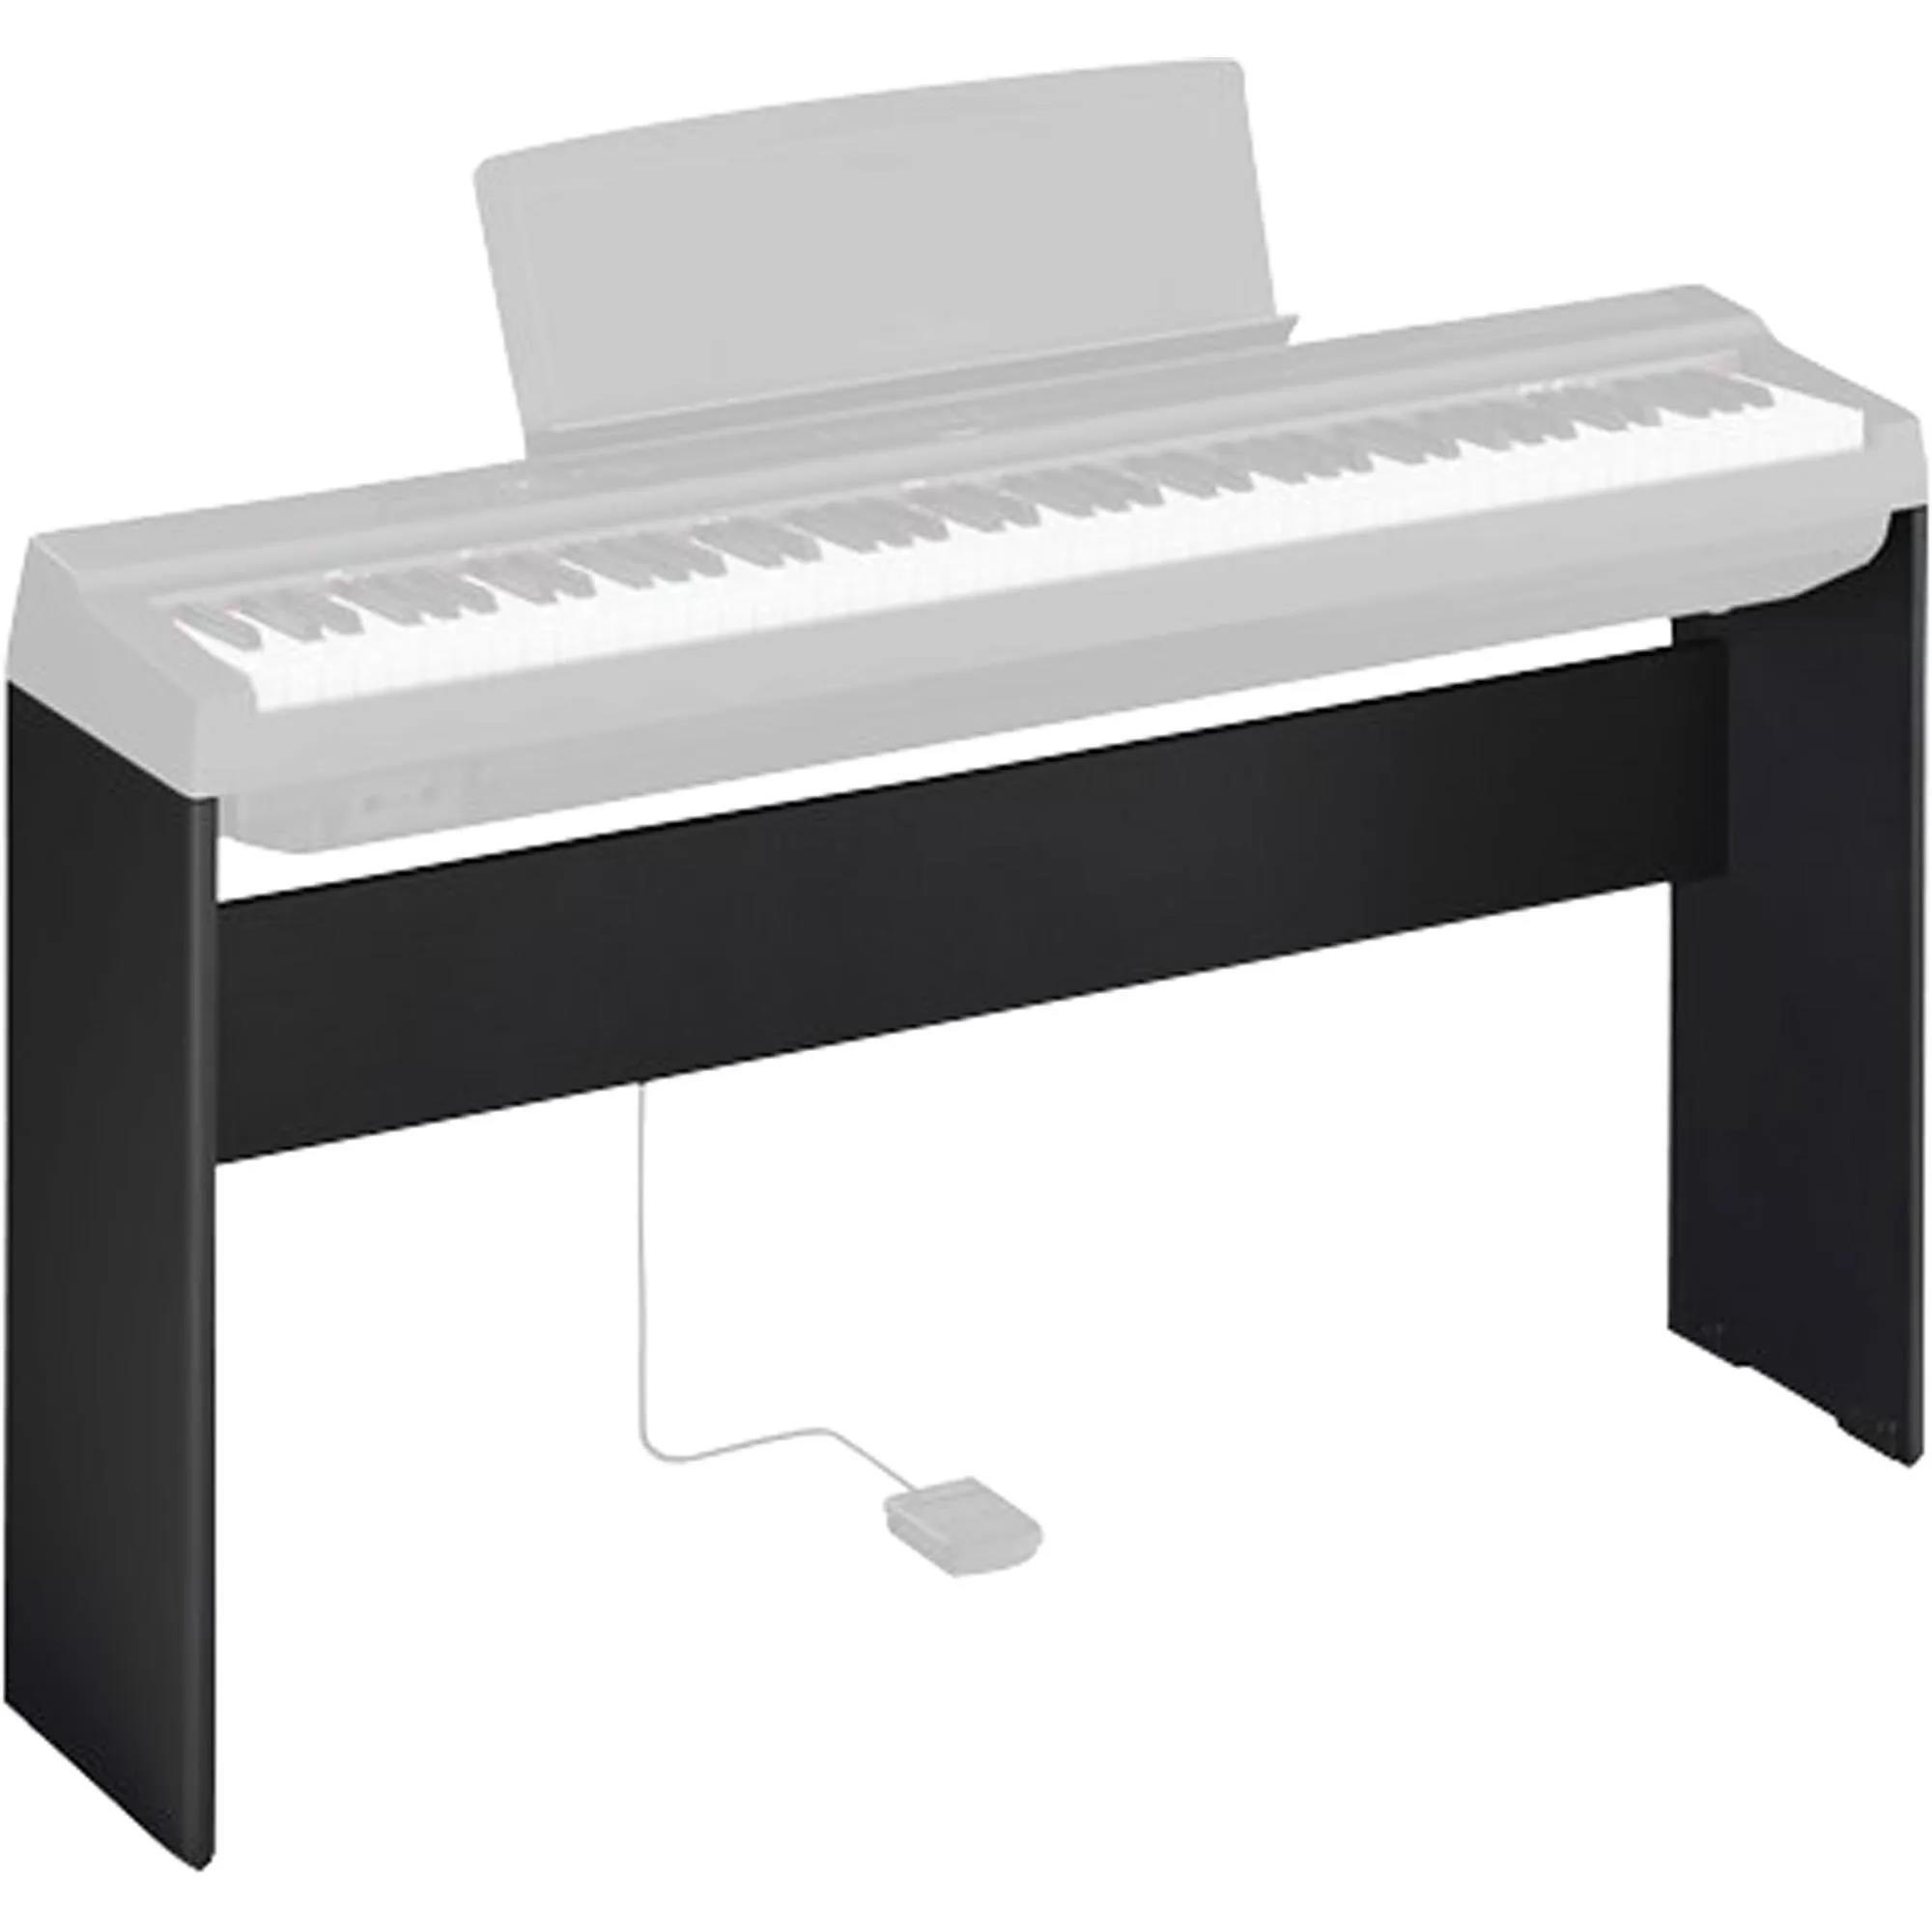 Yamaha Estante para Piano Digital L-125 Preto (P125)